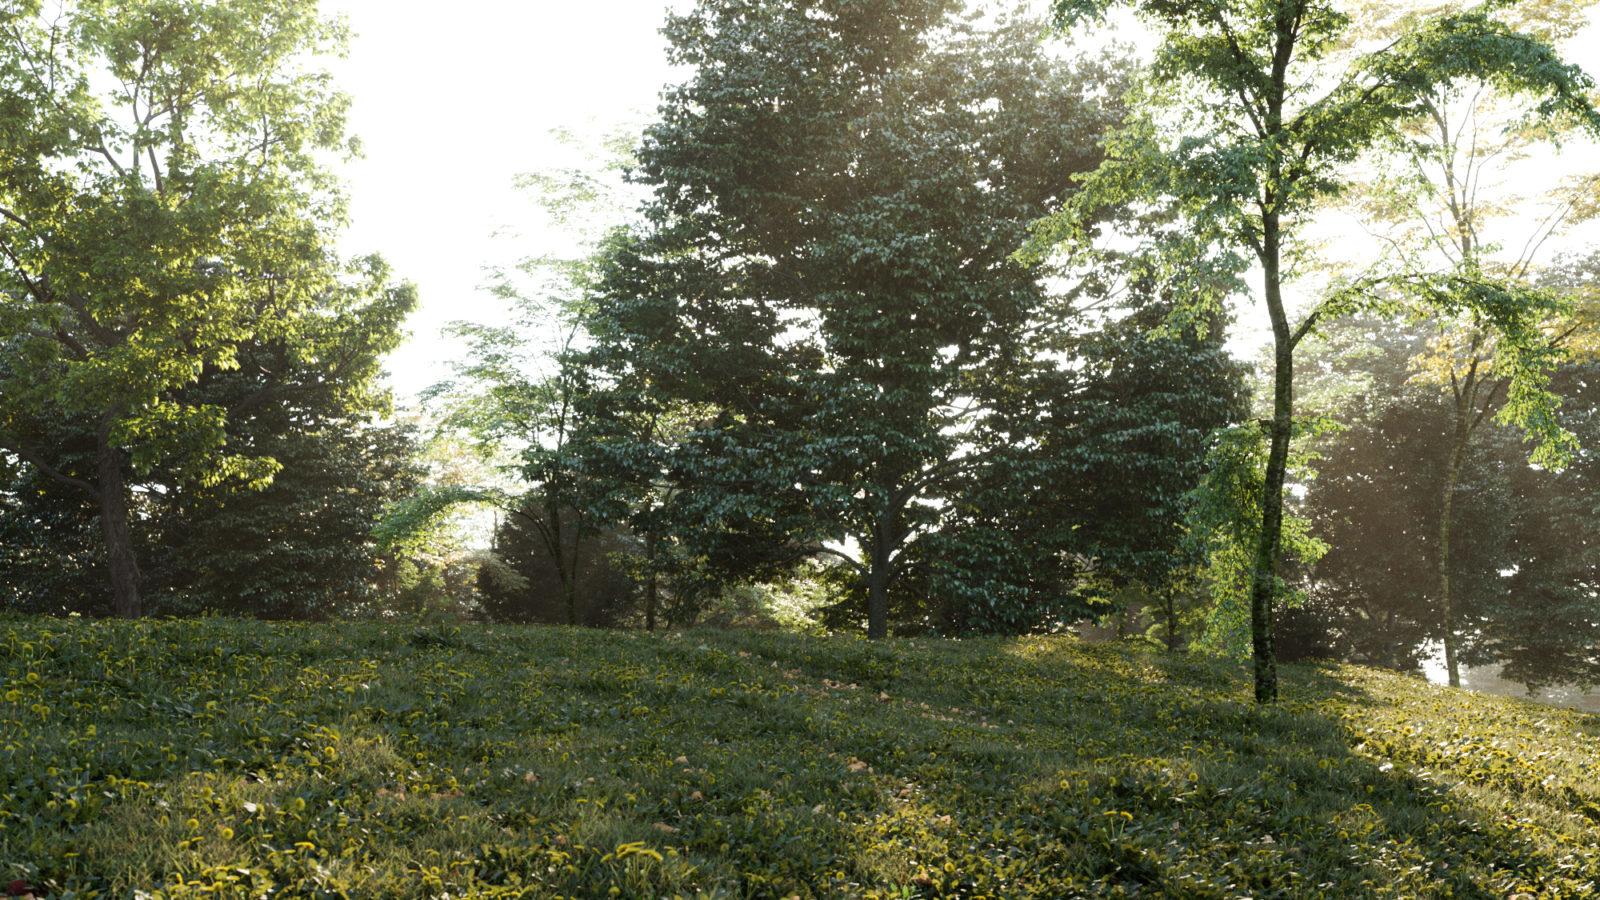 Vegetation_01-1600x900